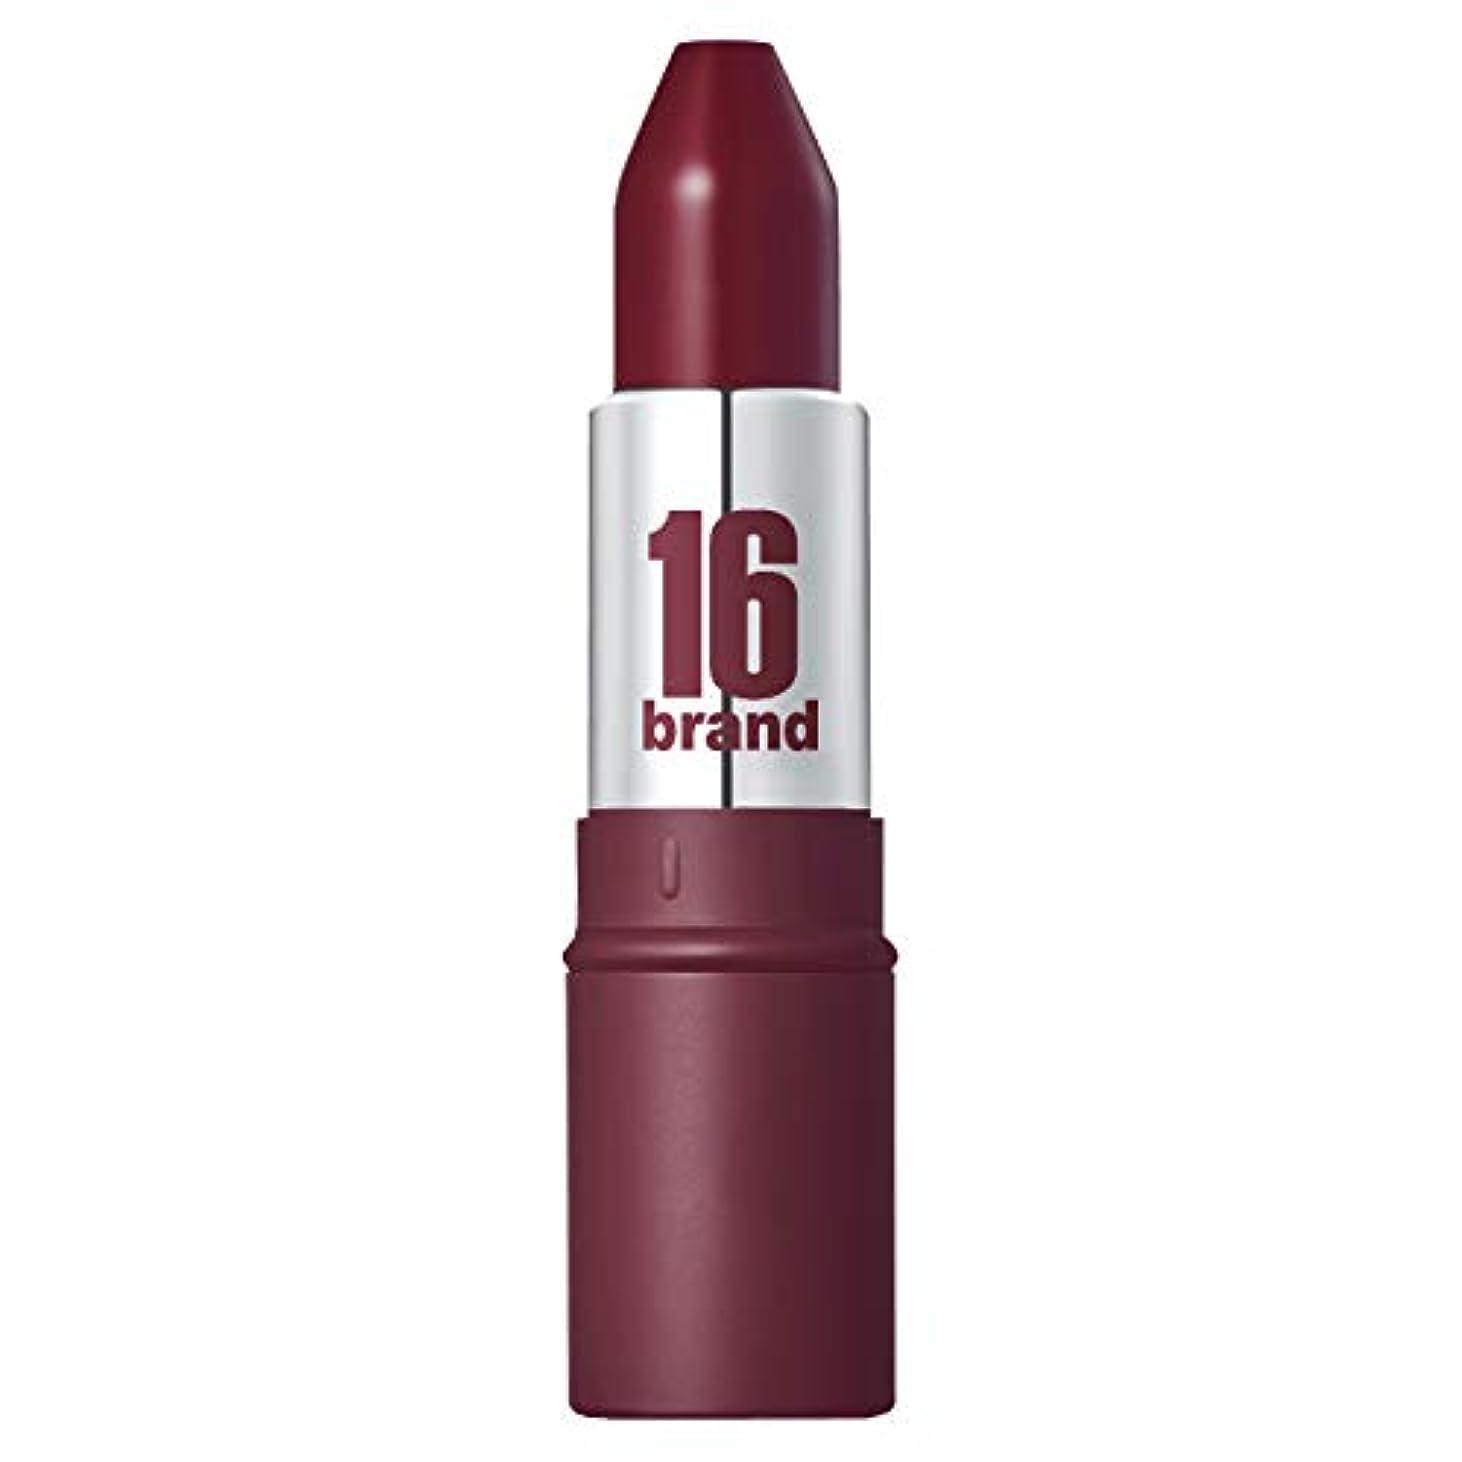 16brand(シックスティーンブランド) TASTE-CHU(テイスチュー) チェリーアーモンド (3.4g)